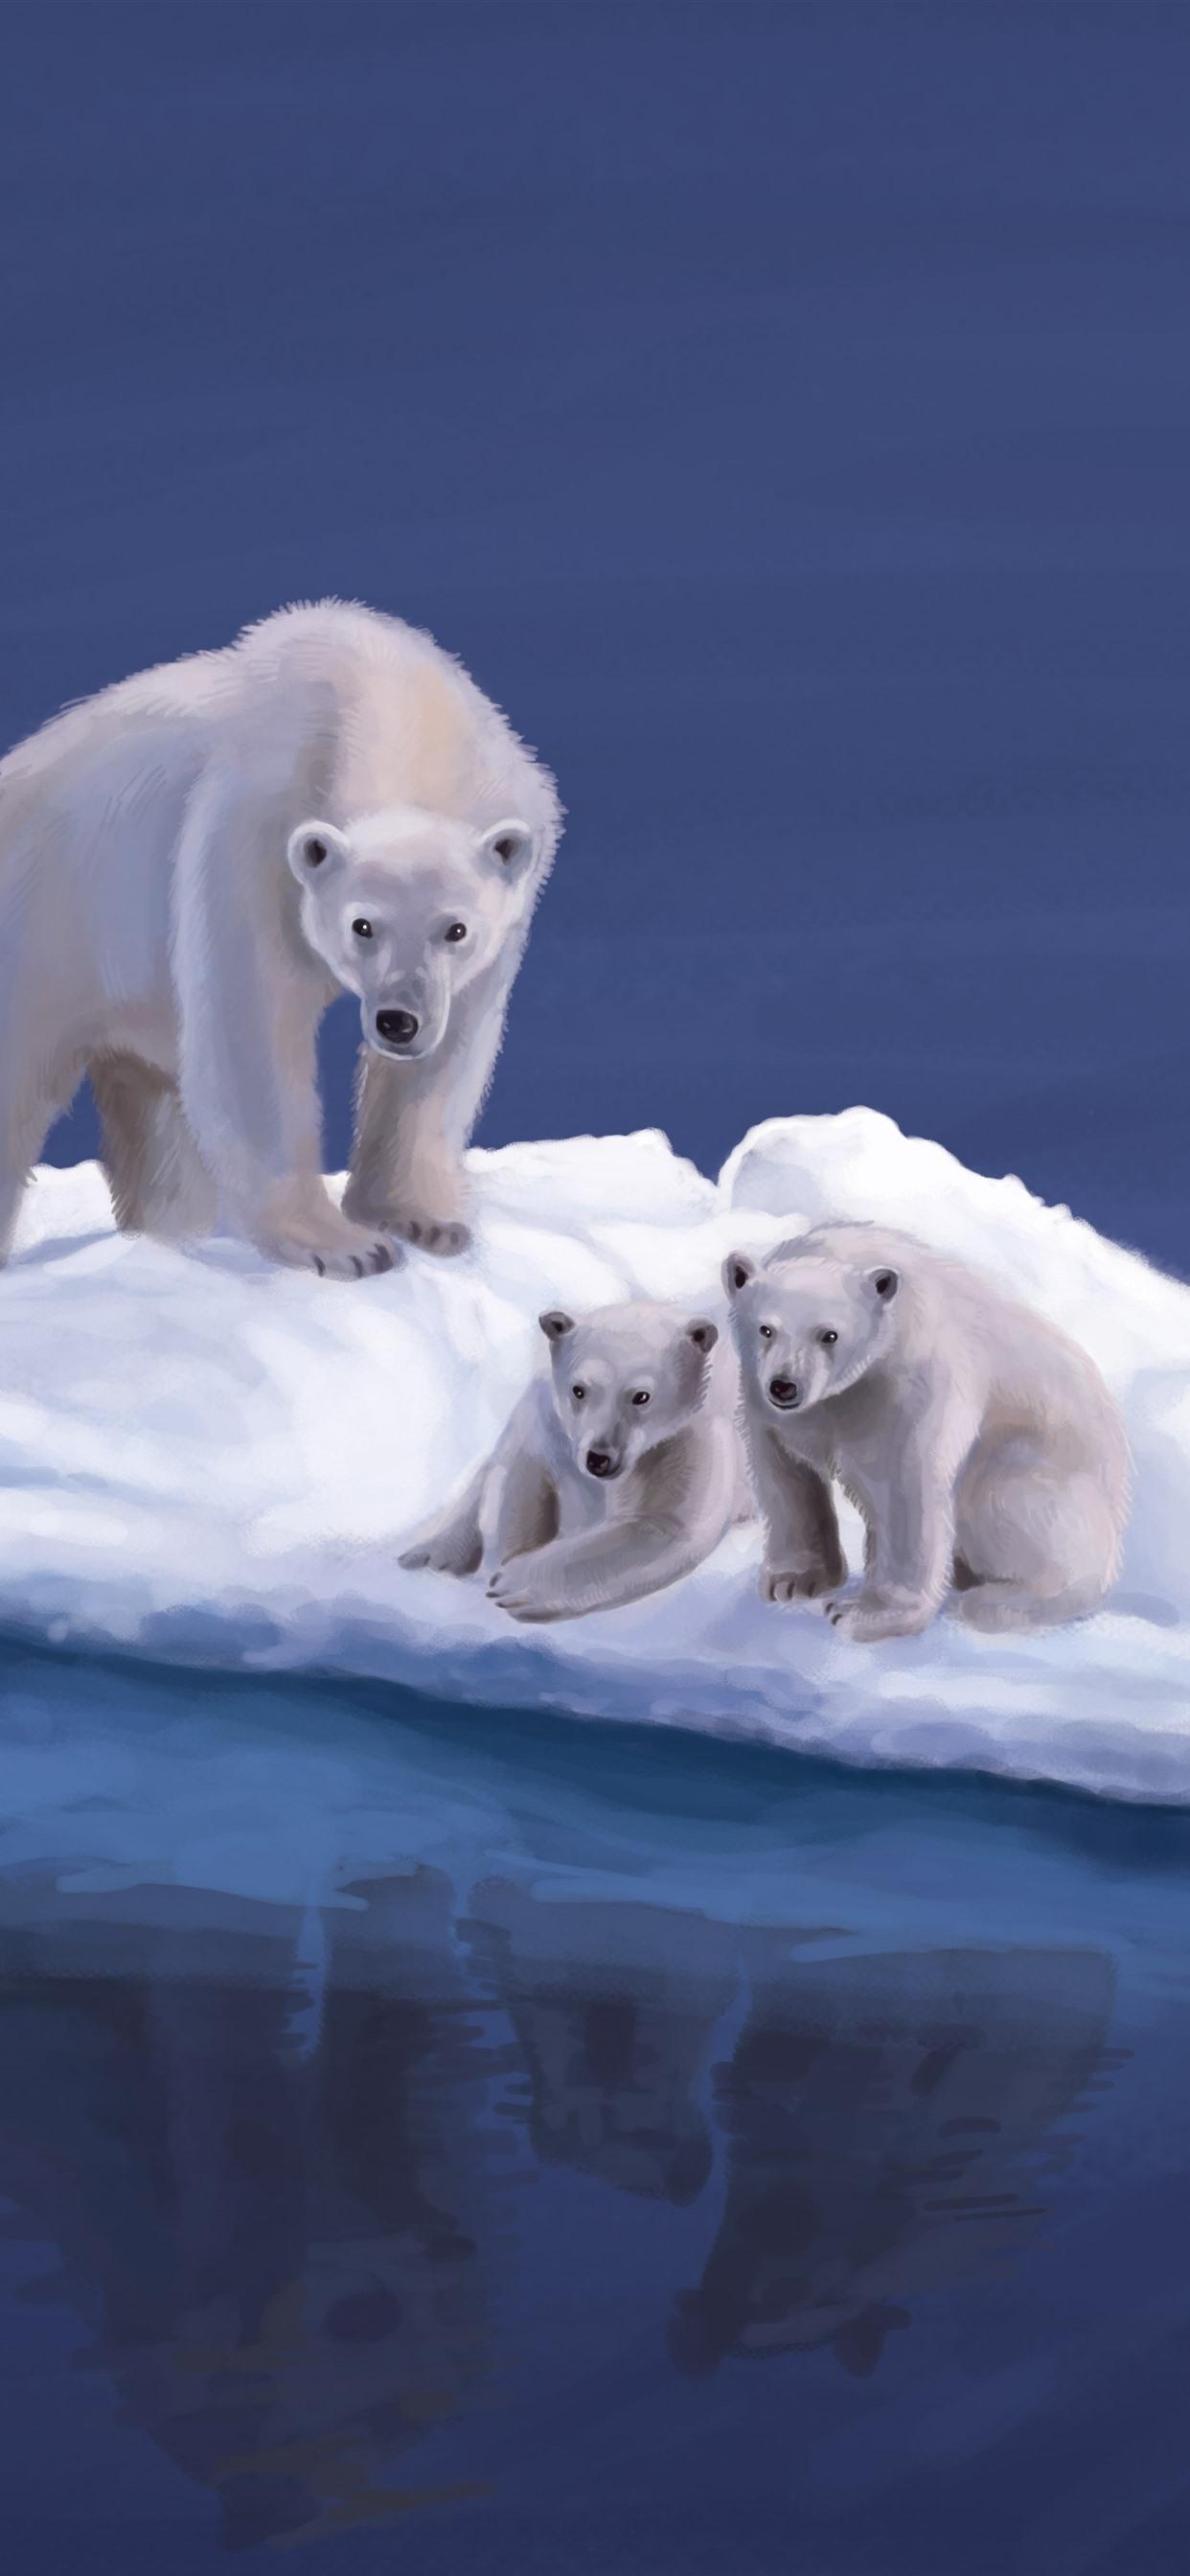 Iphone Wallpaper Polar Bears, Snow Island, Art Picture - 4k Ultra Hd Polar Bear - HD Wallpaper